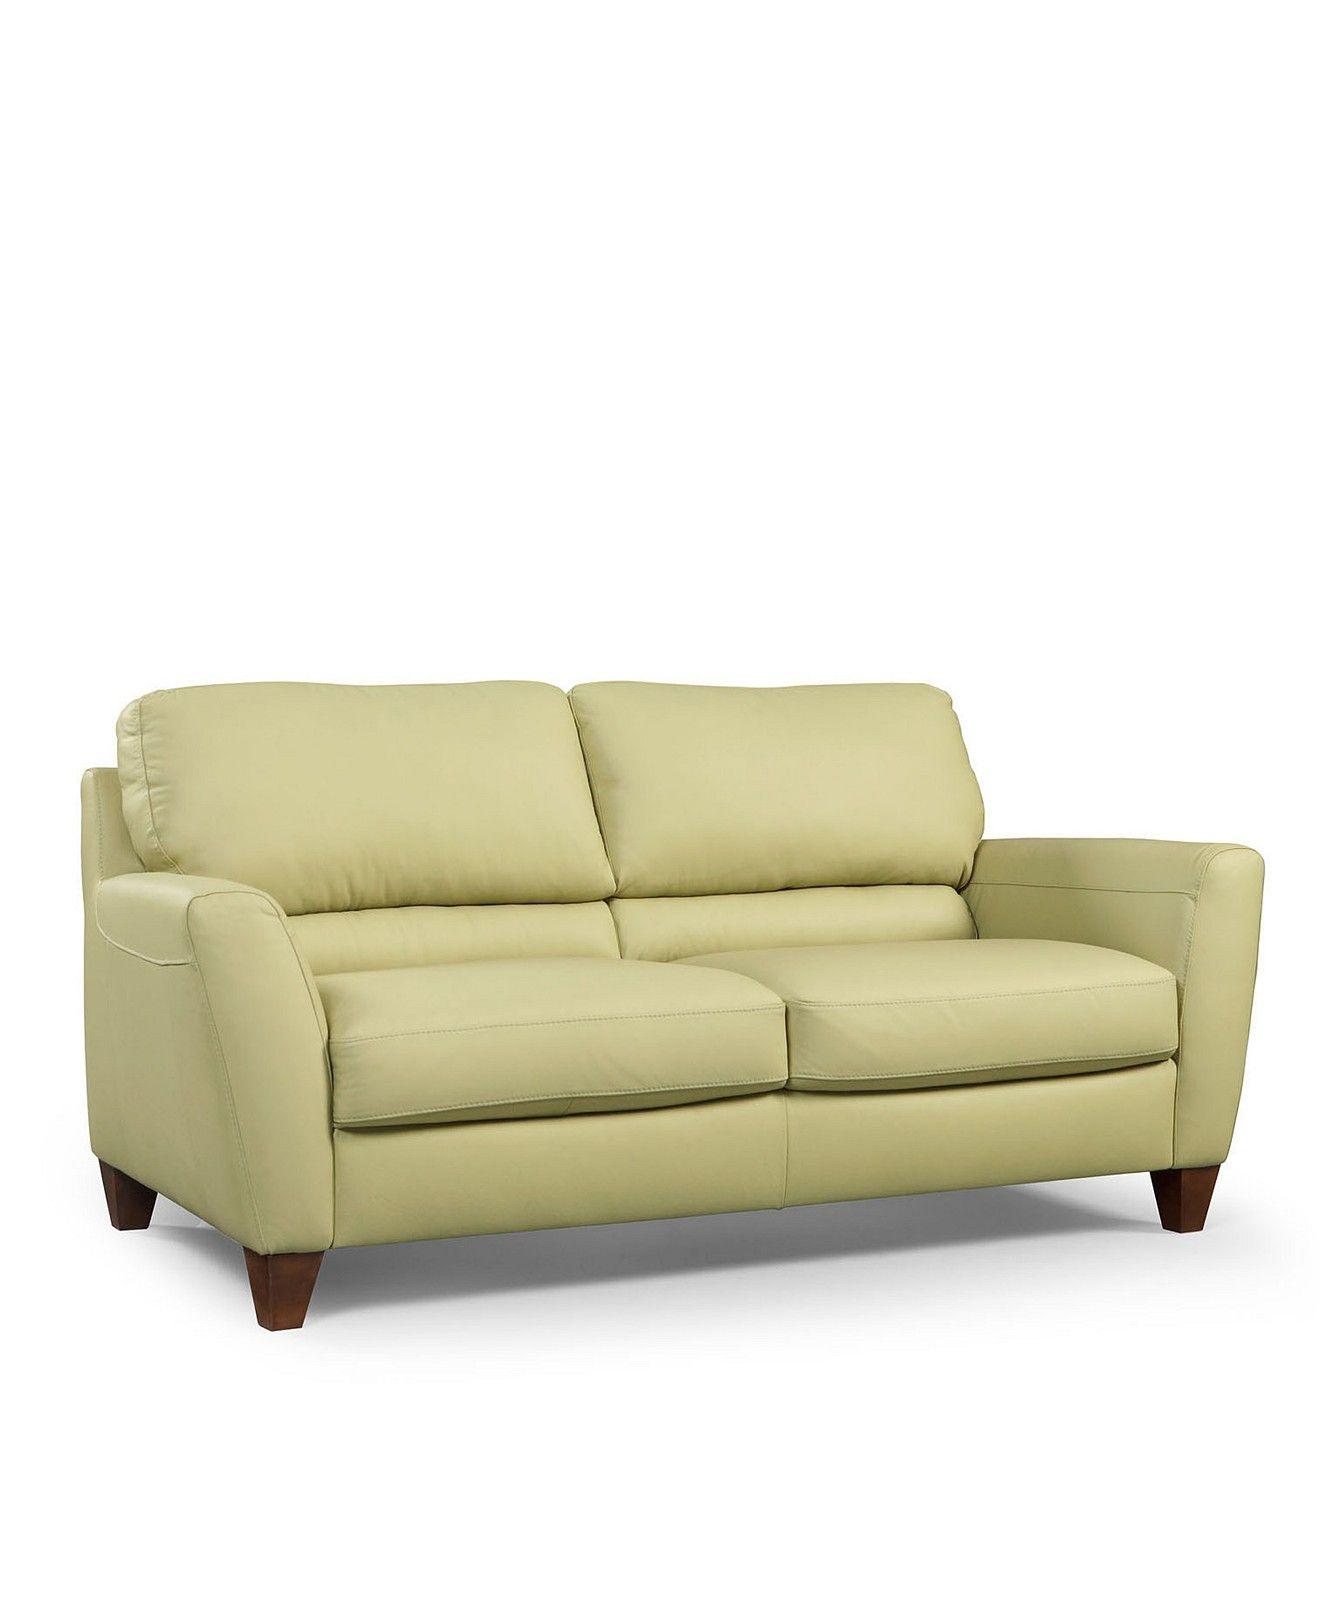 amalfi sofa macys rockers kruder dorfmeister s almafi leather review home co